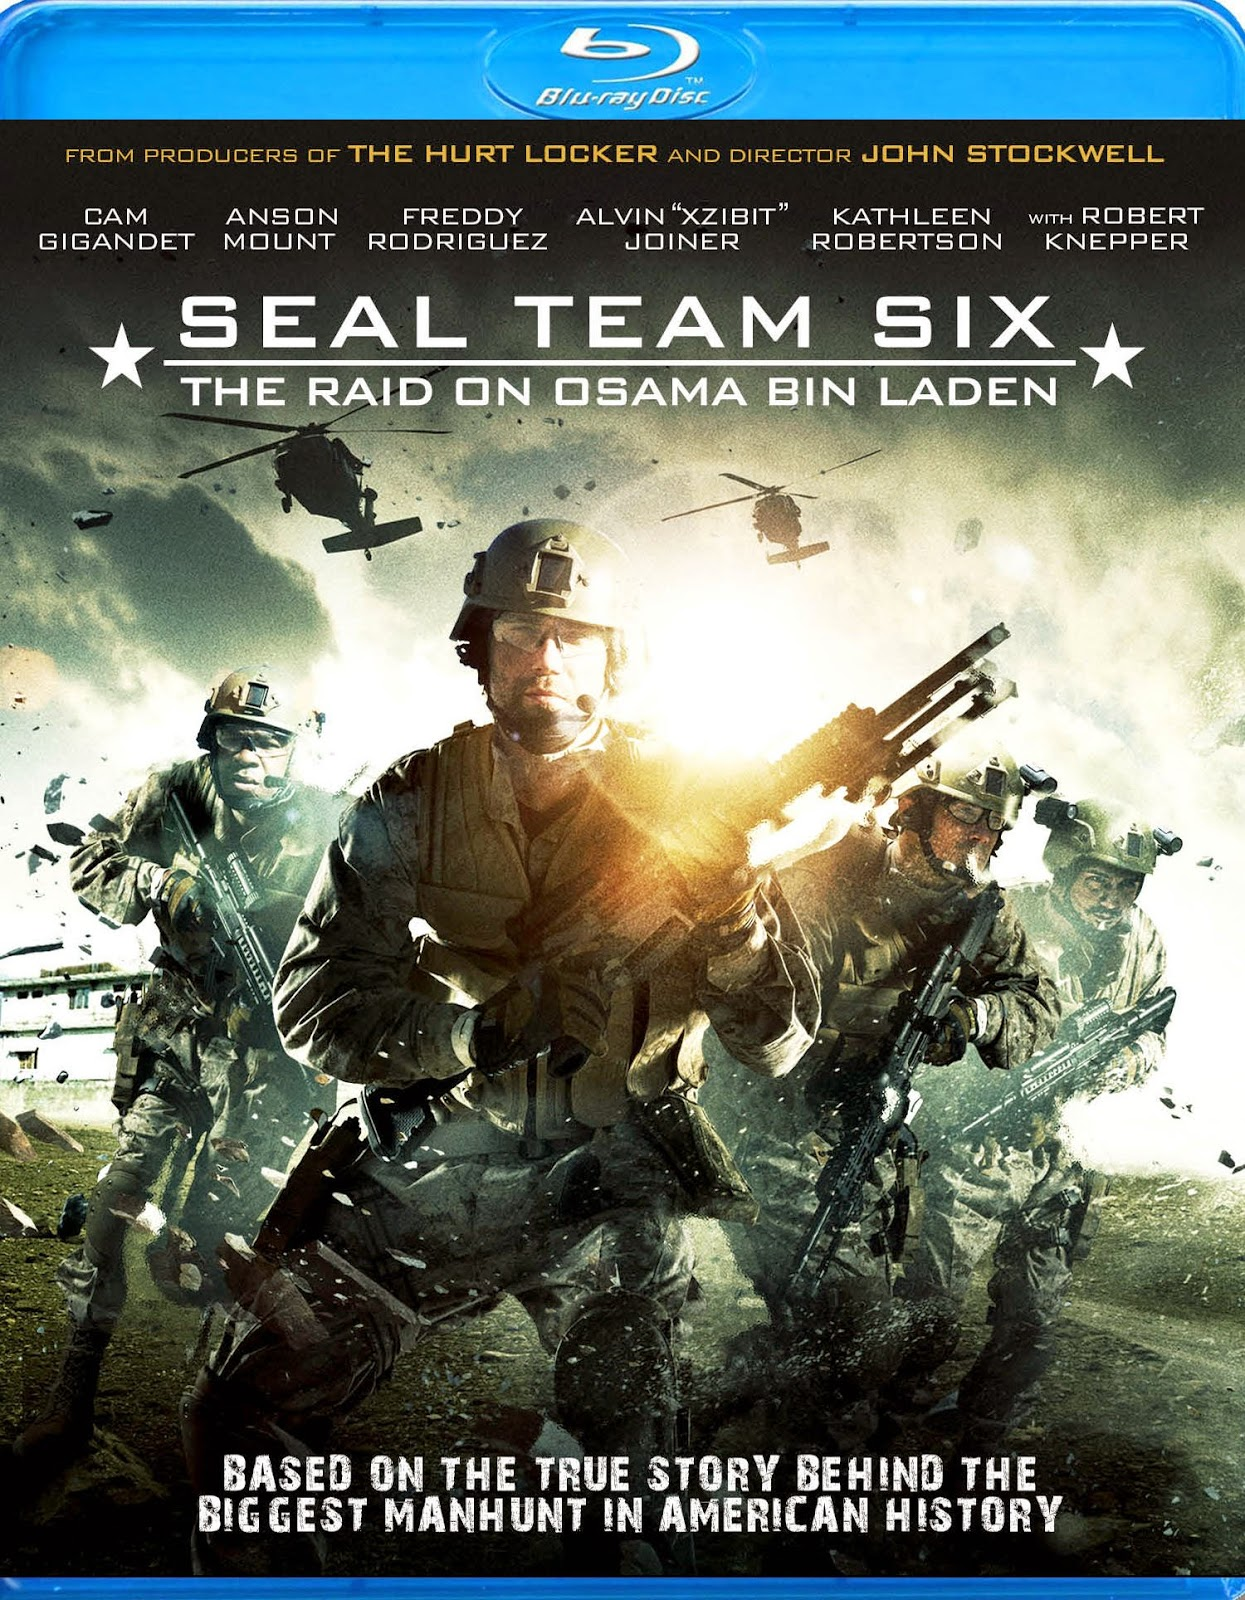 Seal Team Six: The Raid on Osama Bin Laden (2012) ταινιες online seires xrysoi greek subs